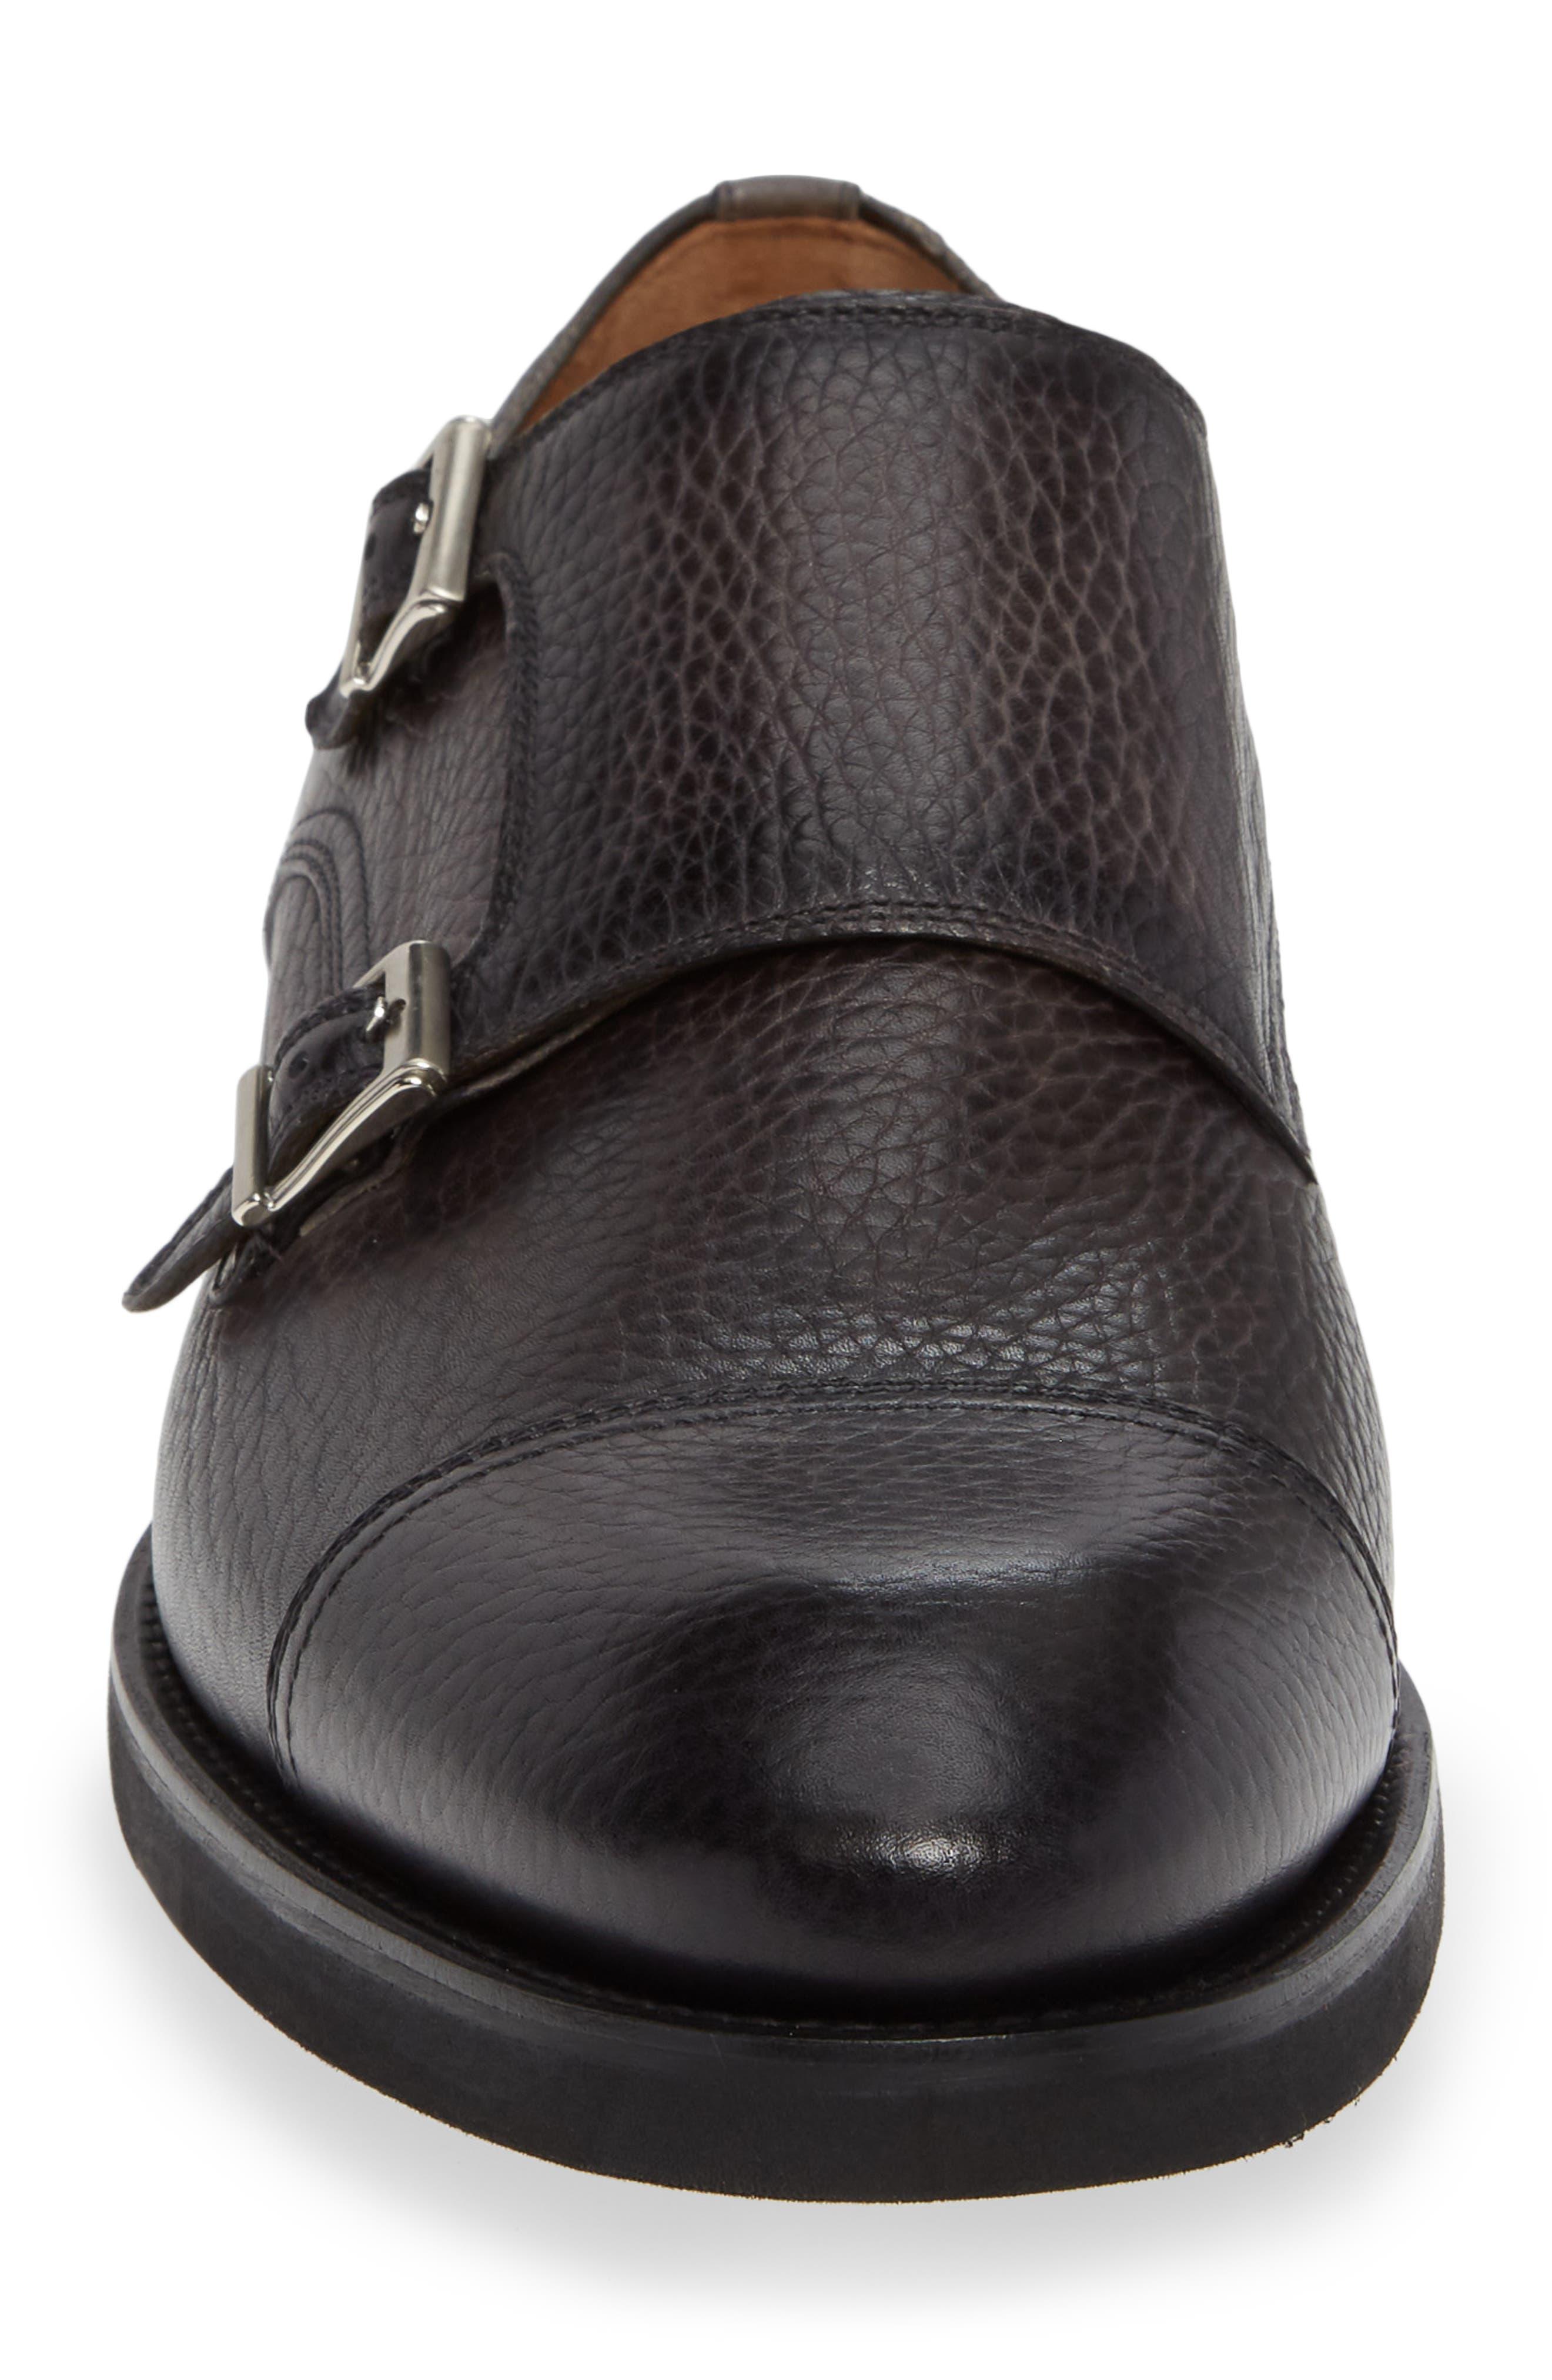 Jebor Double Monk Strap Shoe,                             Alternate thumbnail 4, color,                             GREY